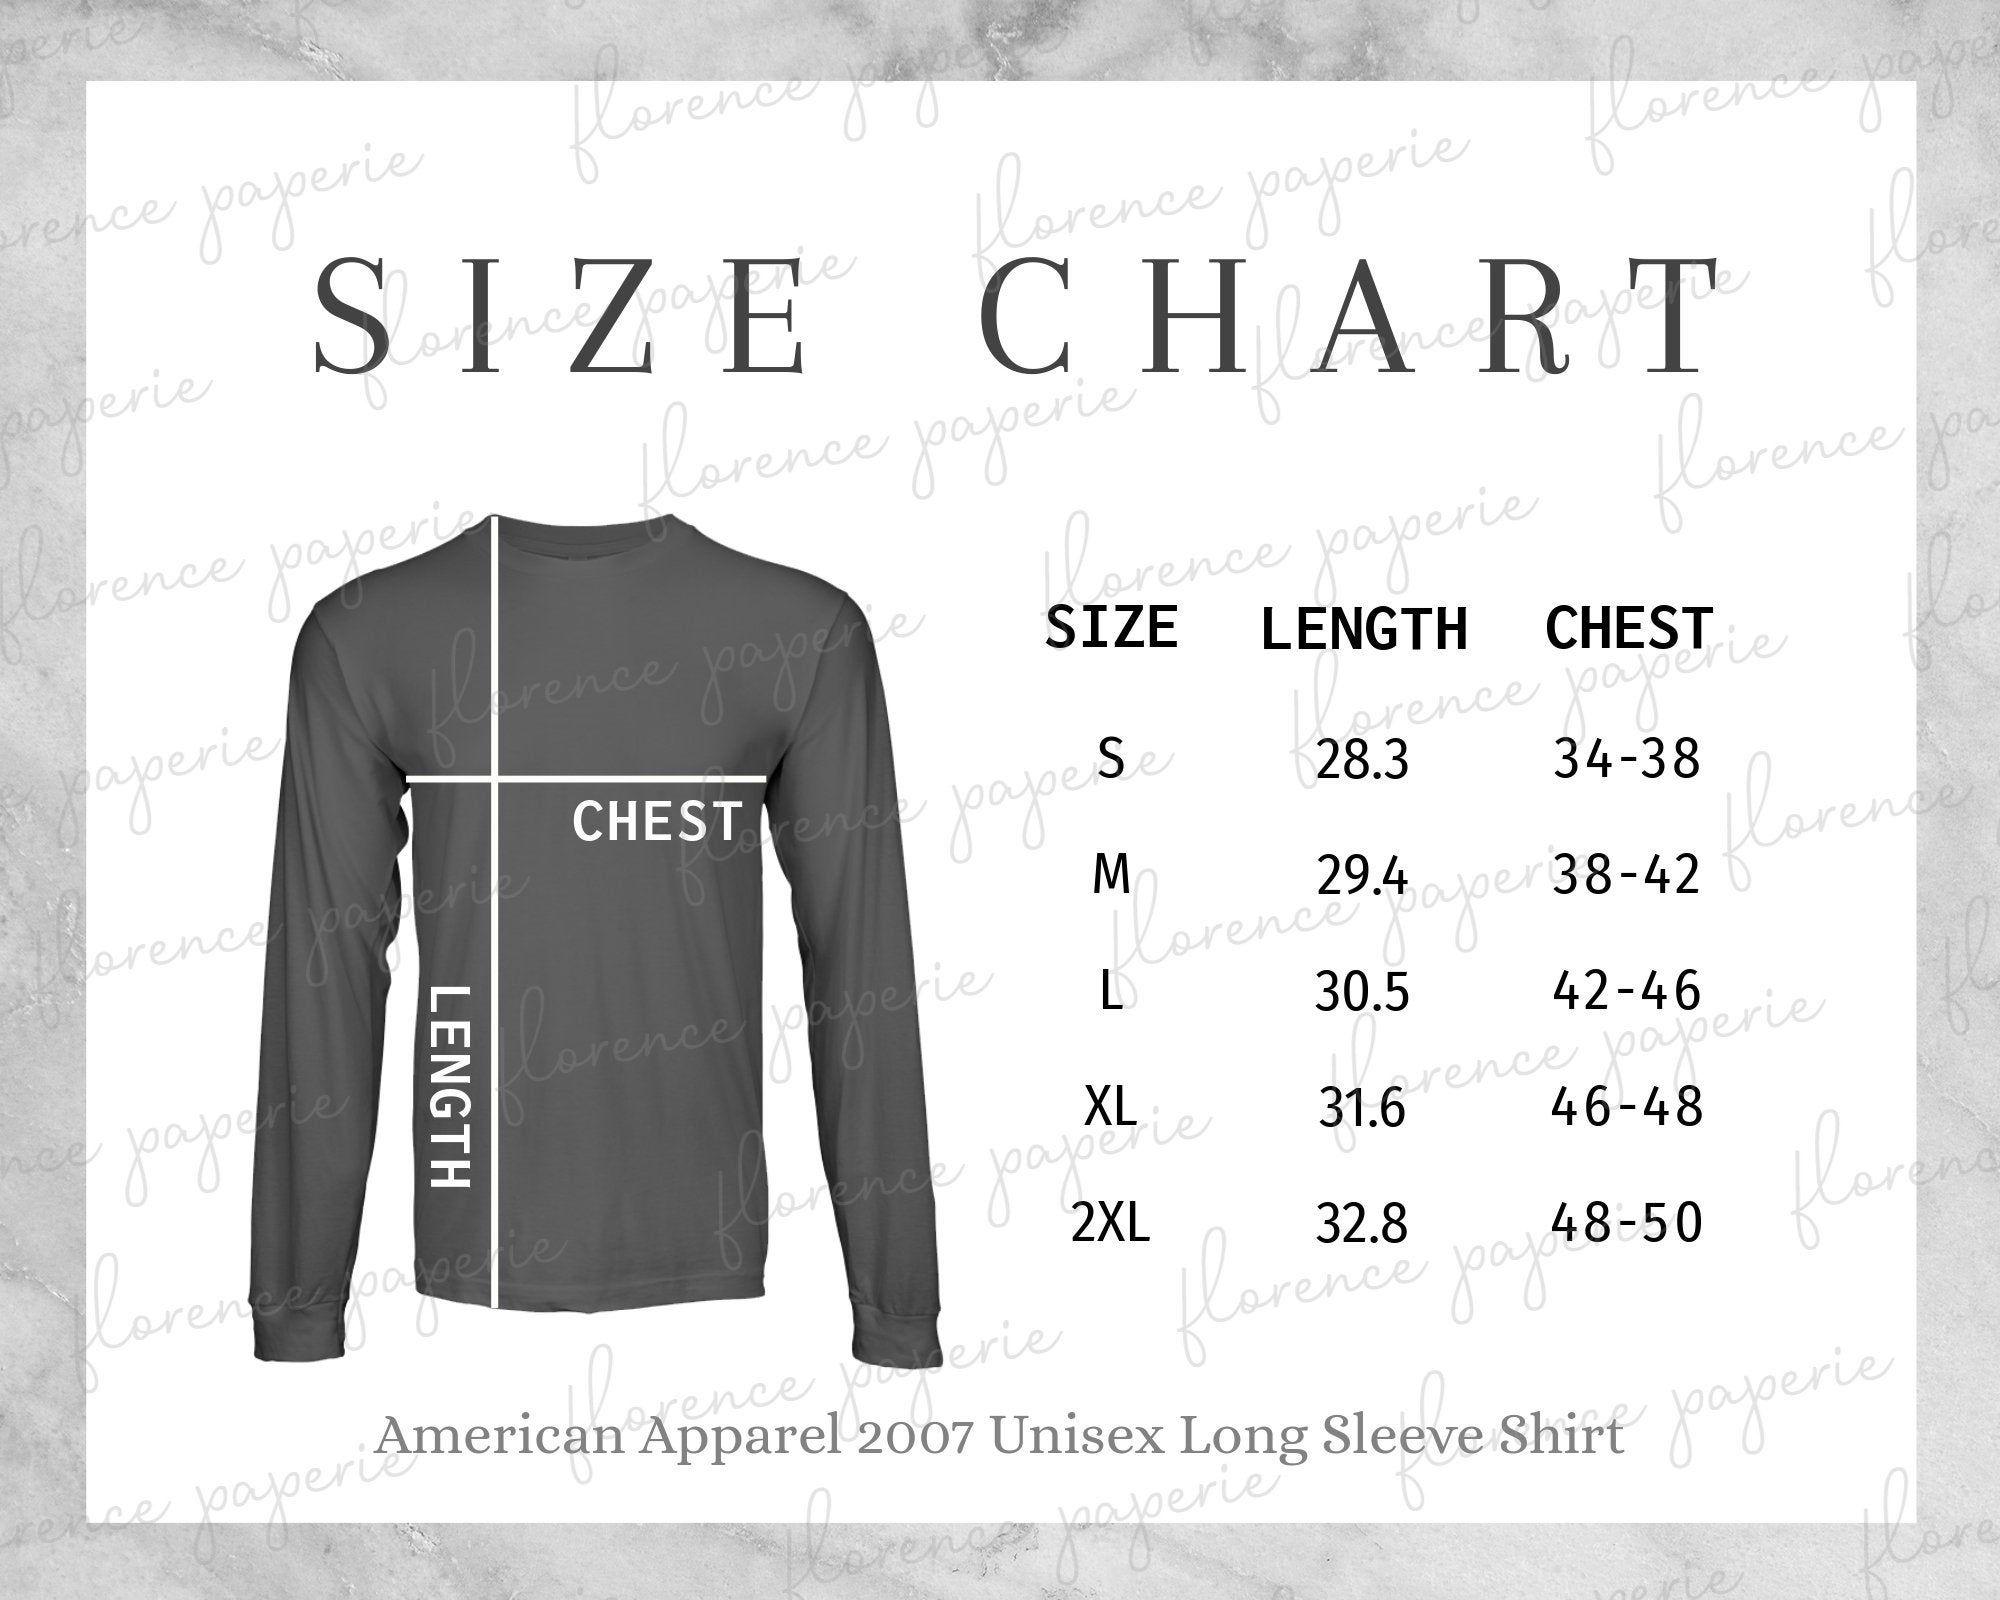 American Apparel 2007 Long Sleeve Shirt Size Chart Unisex Long Sleeve Shirt Downloadable Mens Size Chart Womens Size Chart Printful In 2021 Long Sleeve Shirts Long Sleeve Tshirt Men Size Chart